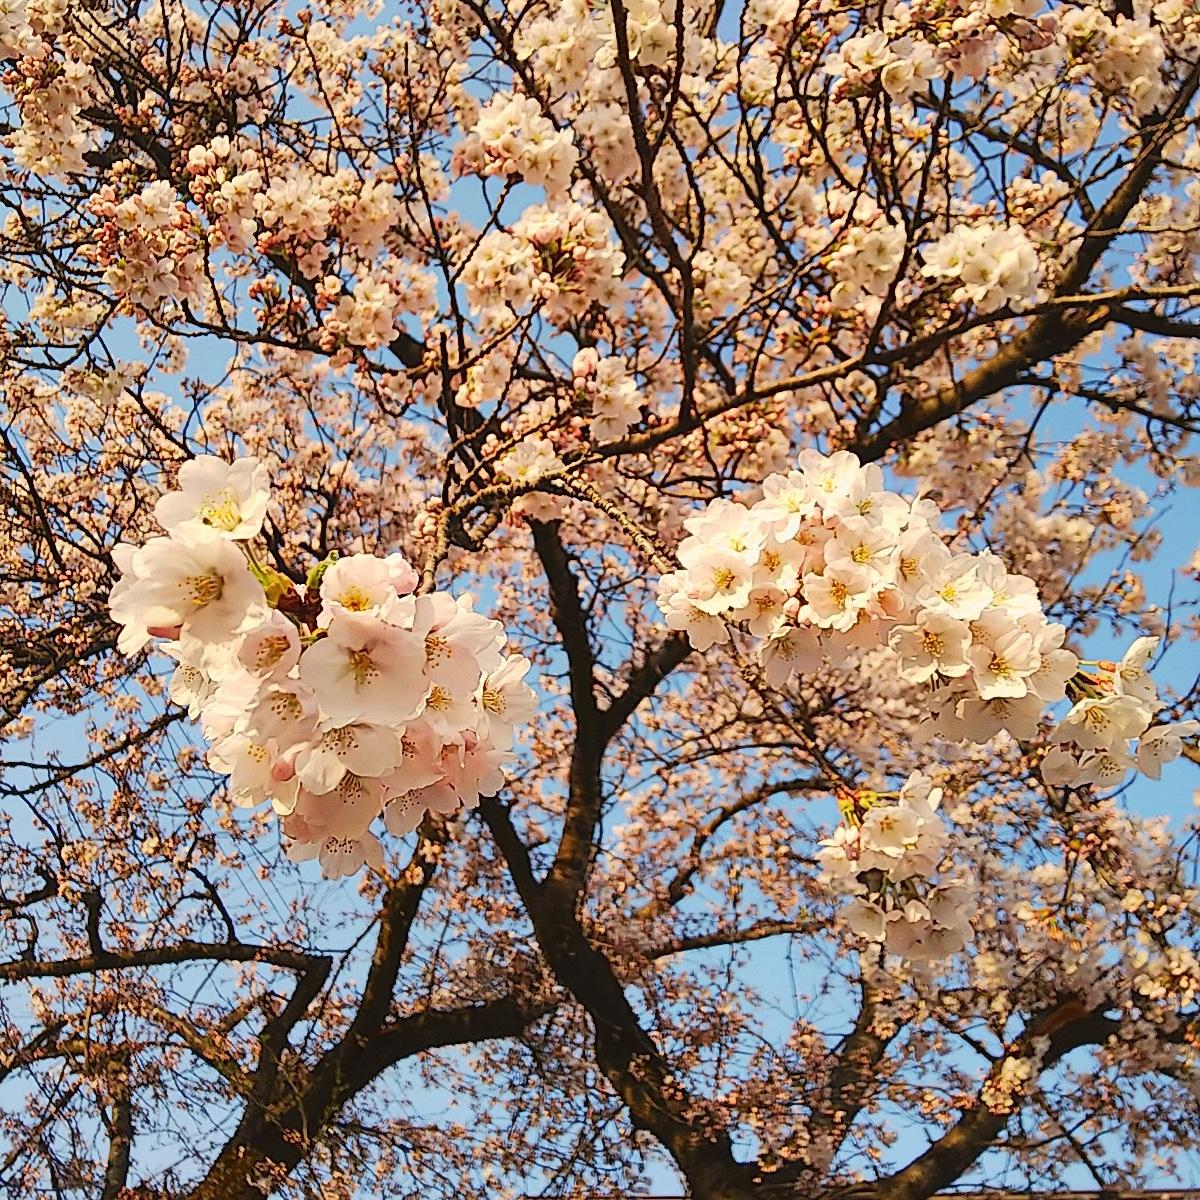 http://www.fukukomachi.com/blog/photo/IMG_20180421_054800_734.jpg